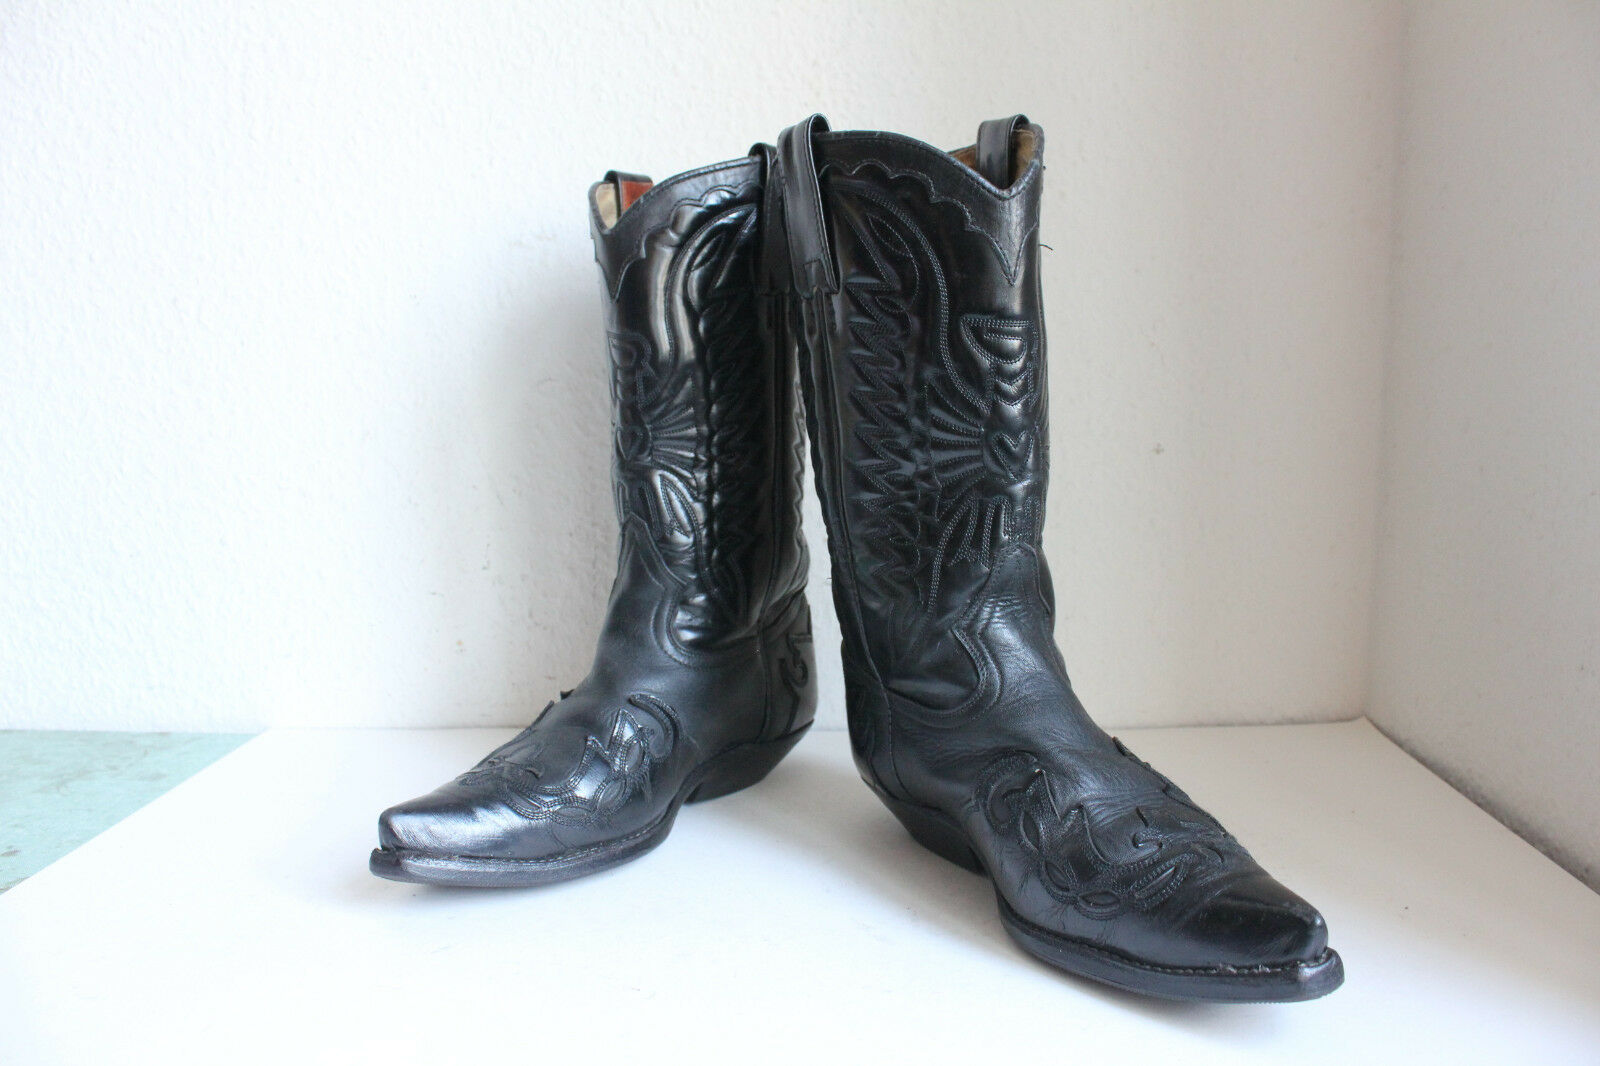 PrimeStiefel Western Stiefel Cowboystiefel Voll Echtleder Schwarz Eu 40,5-41